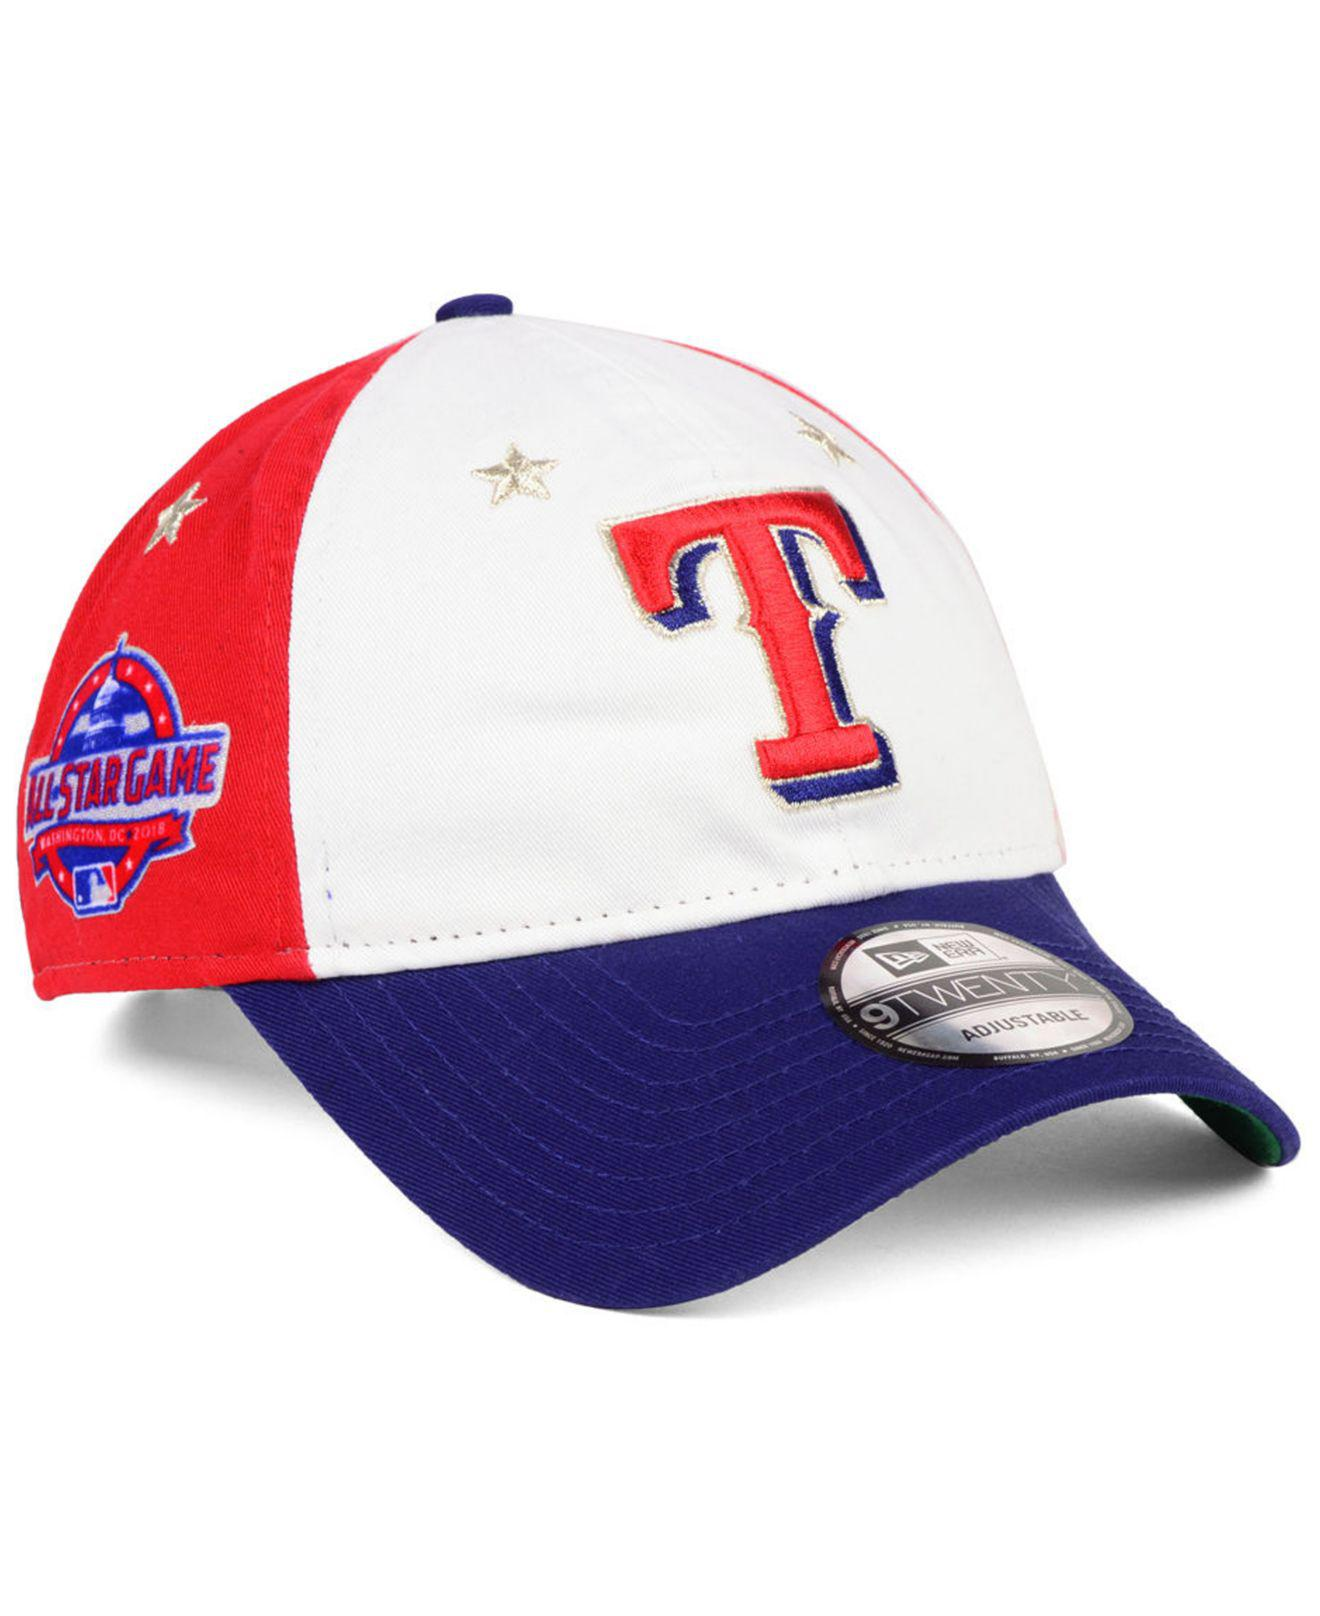 info for 67368 60572 ... 59fifty fitted cap in blue for men 1f8c8 spain ktz. mens red texas  rangers all star game 9twenty strapback cap 2018 29705 08de2 ...